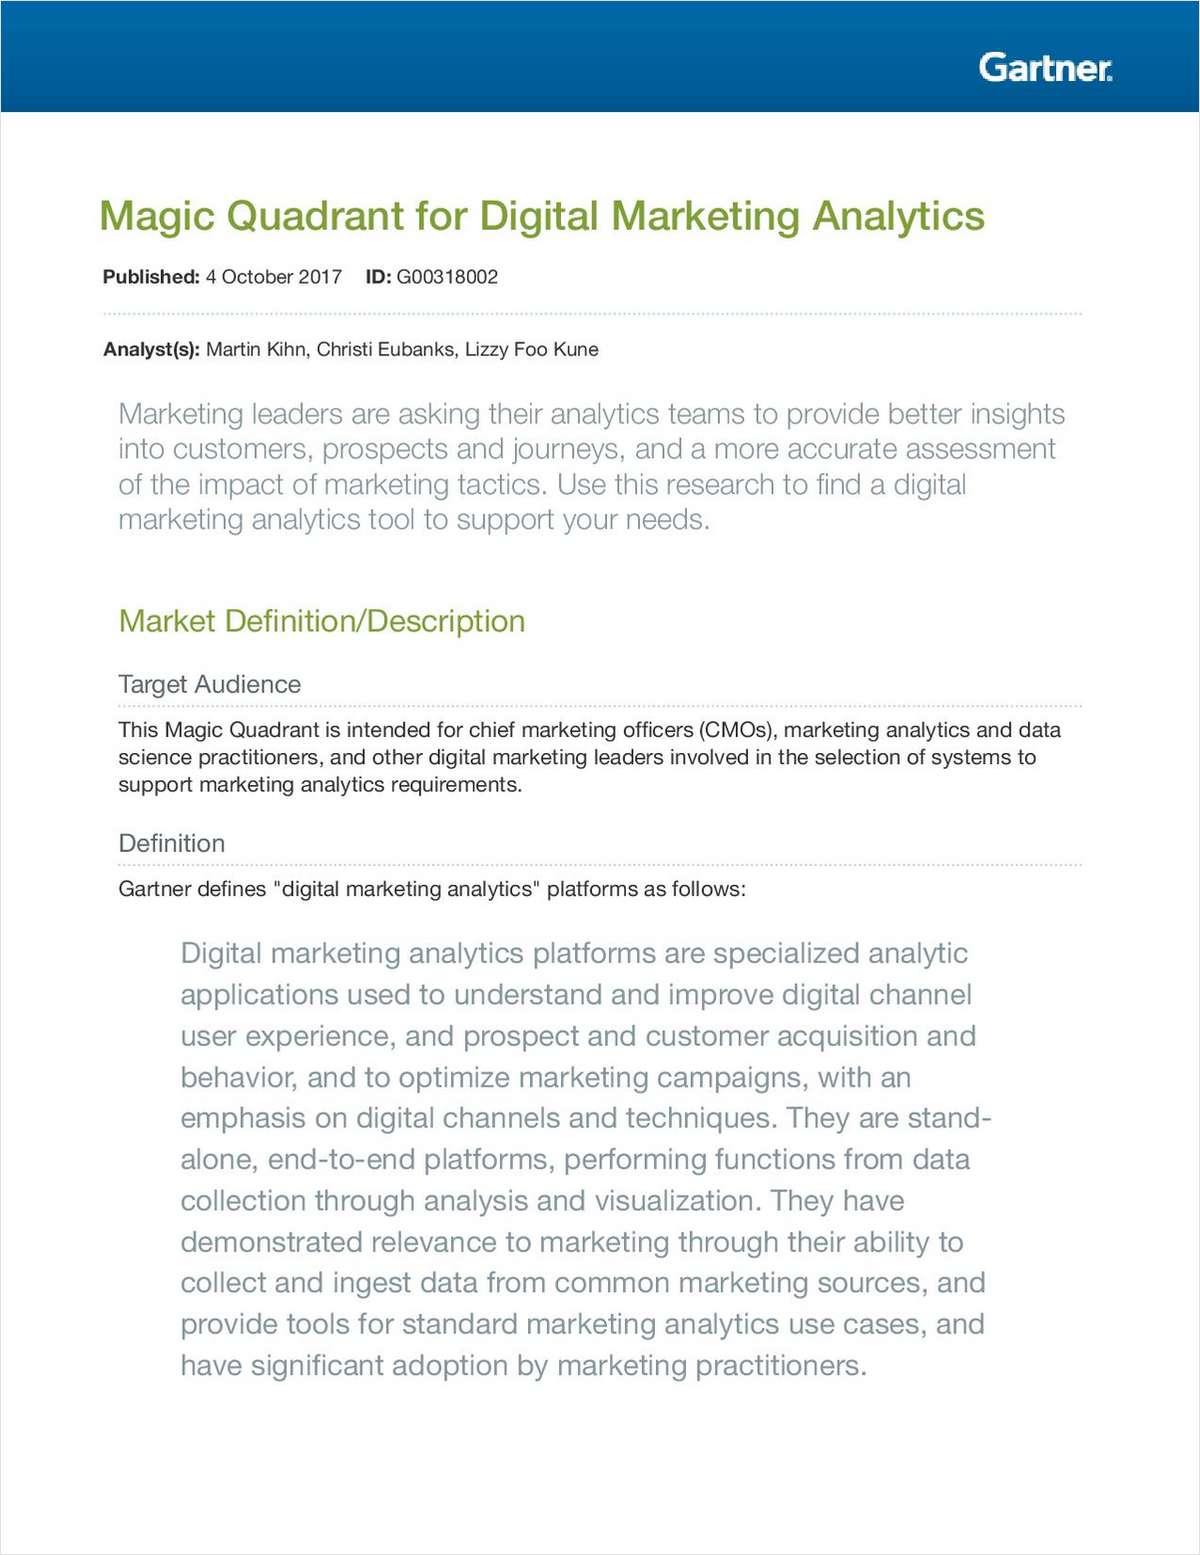 Gartner MQ: Digital Marketing Analytics